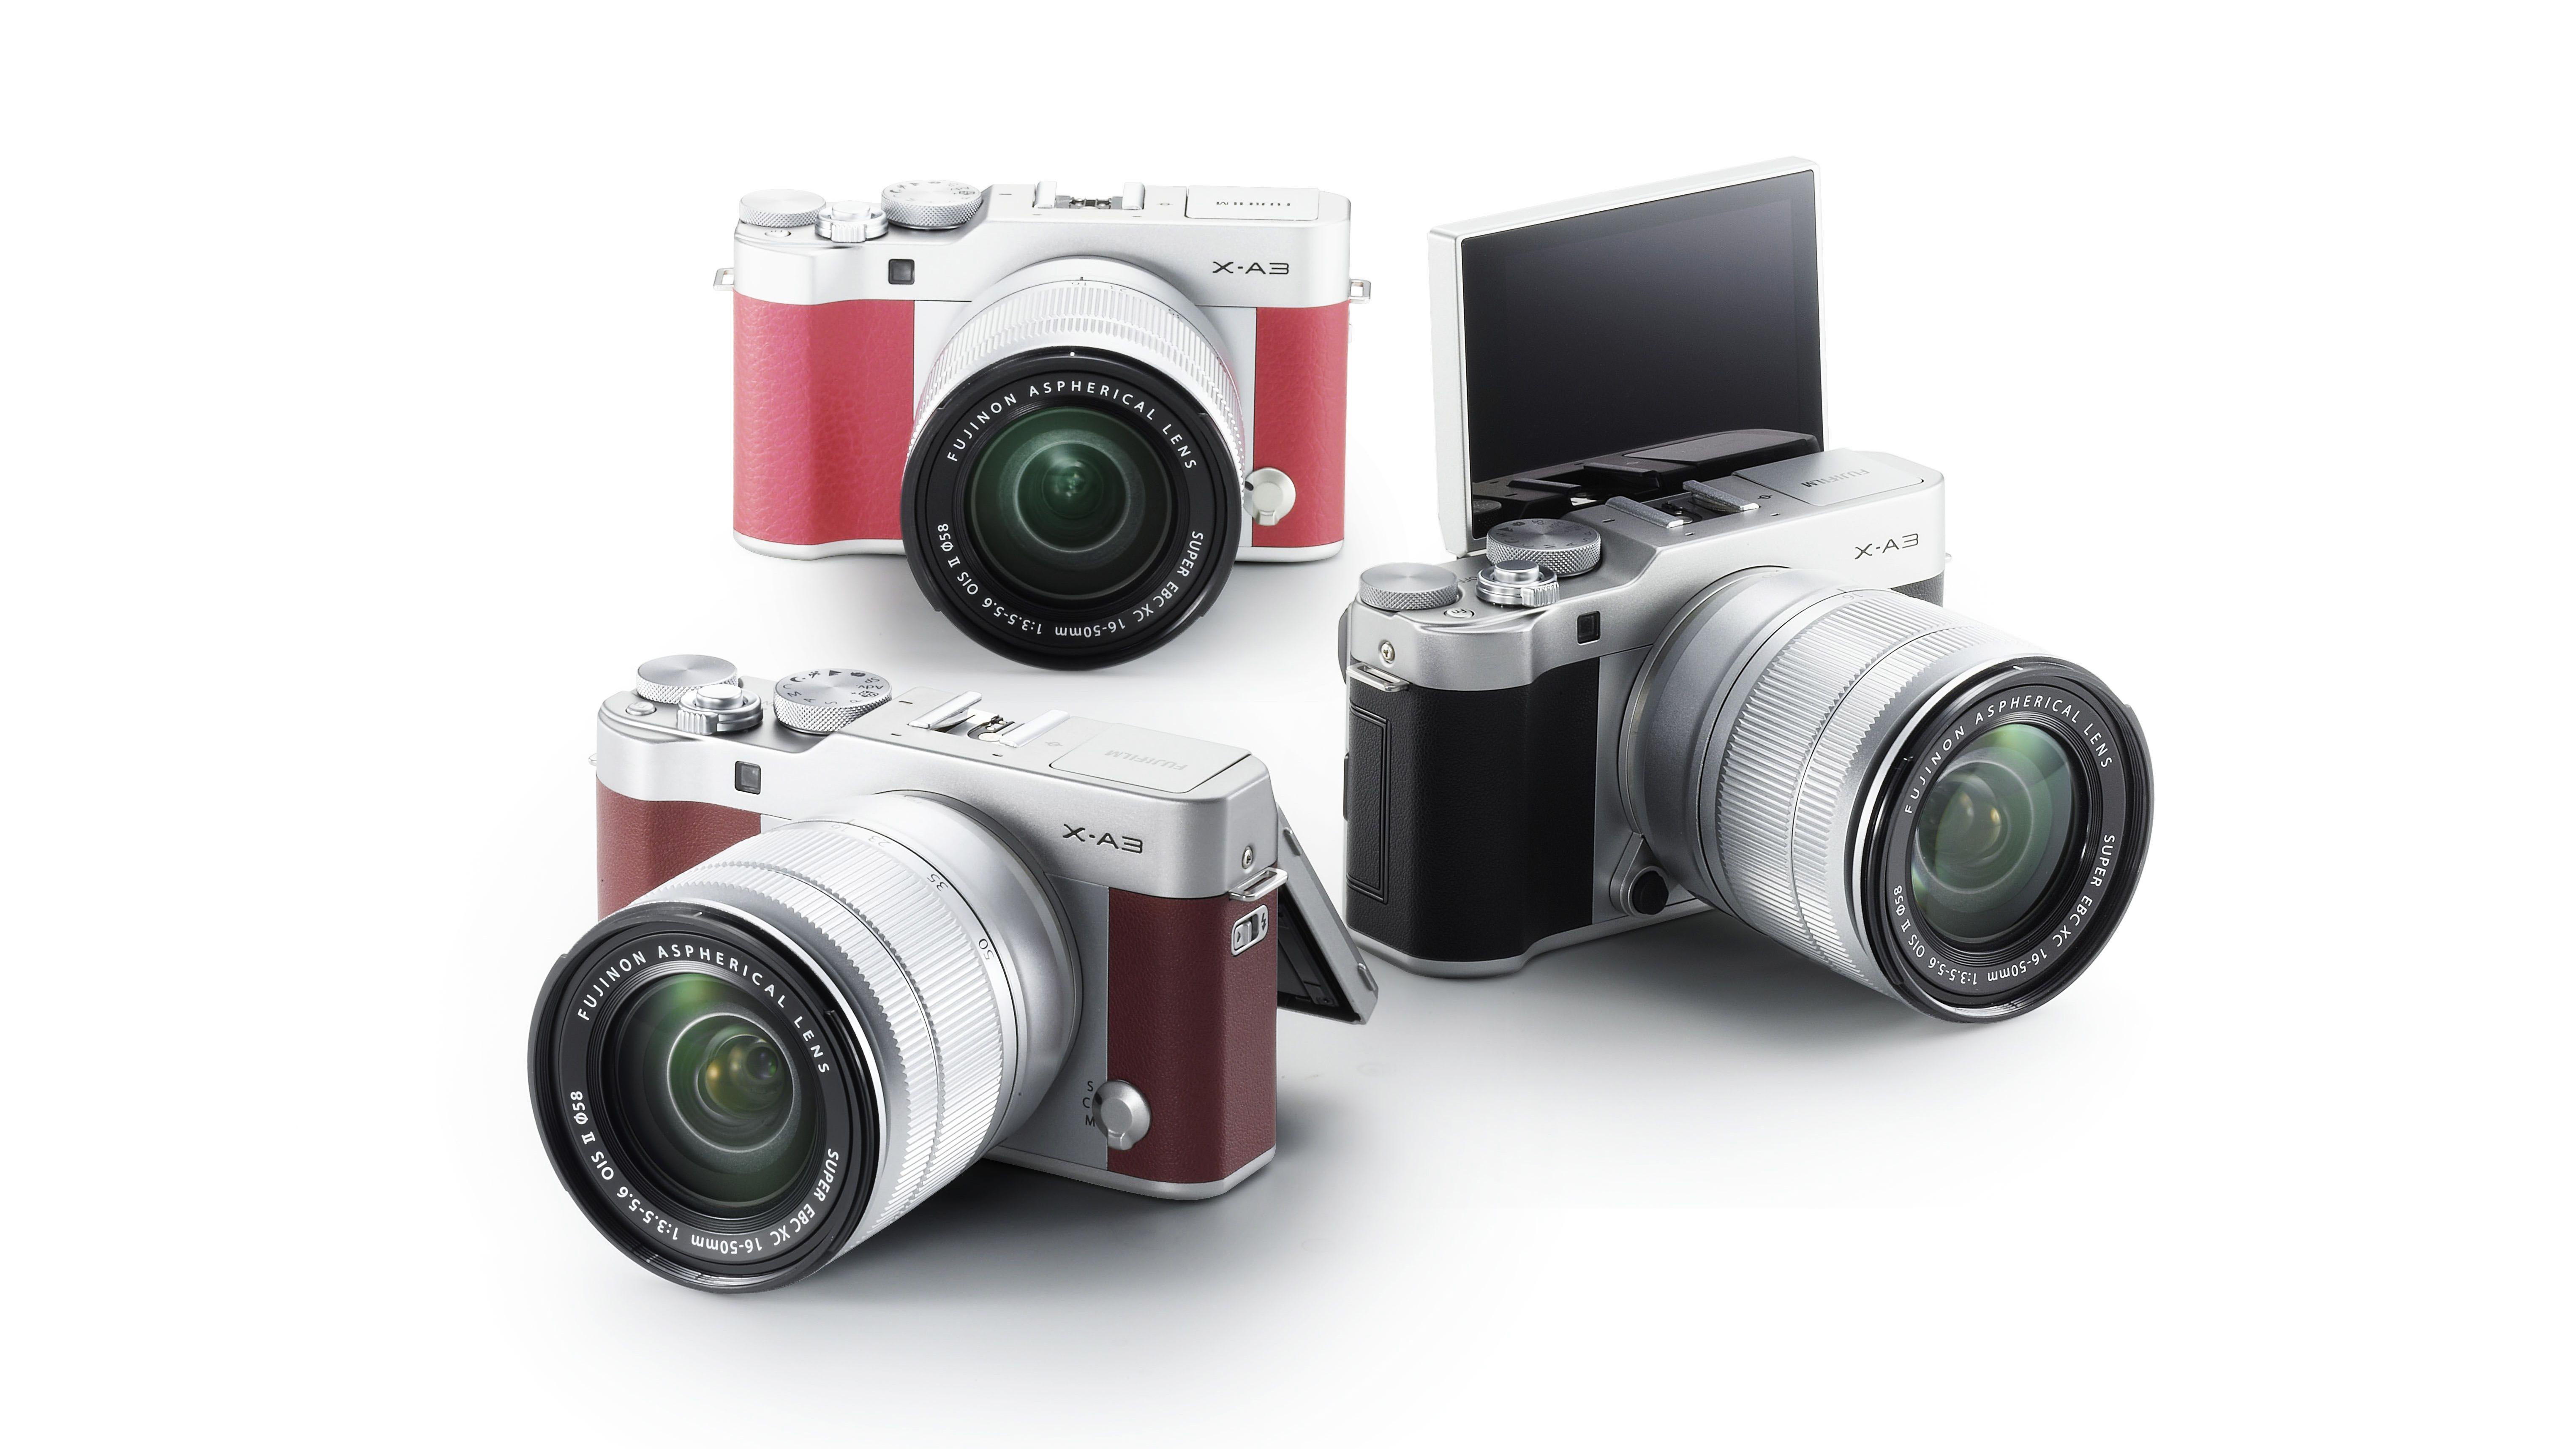 The Fujifilm X-A3 is the retro camera for selfie lovers | TechRadar